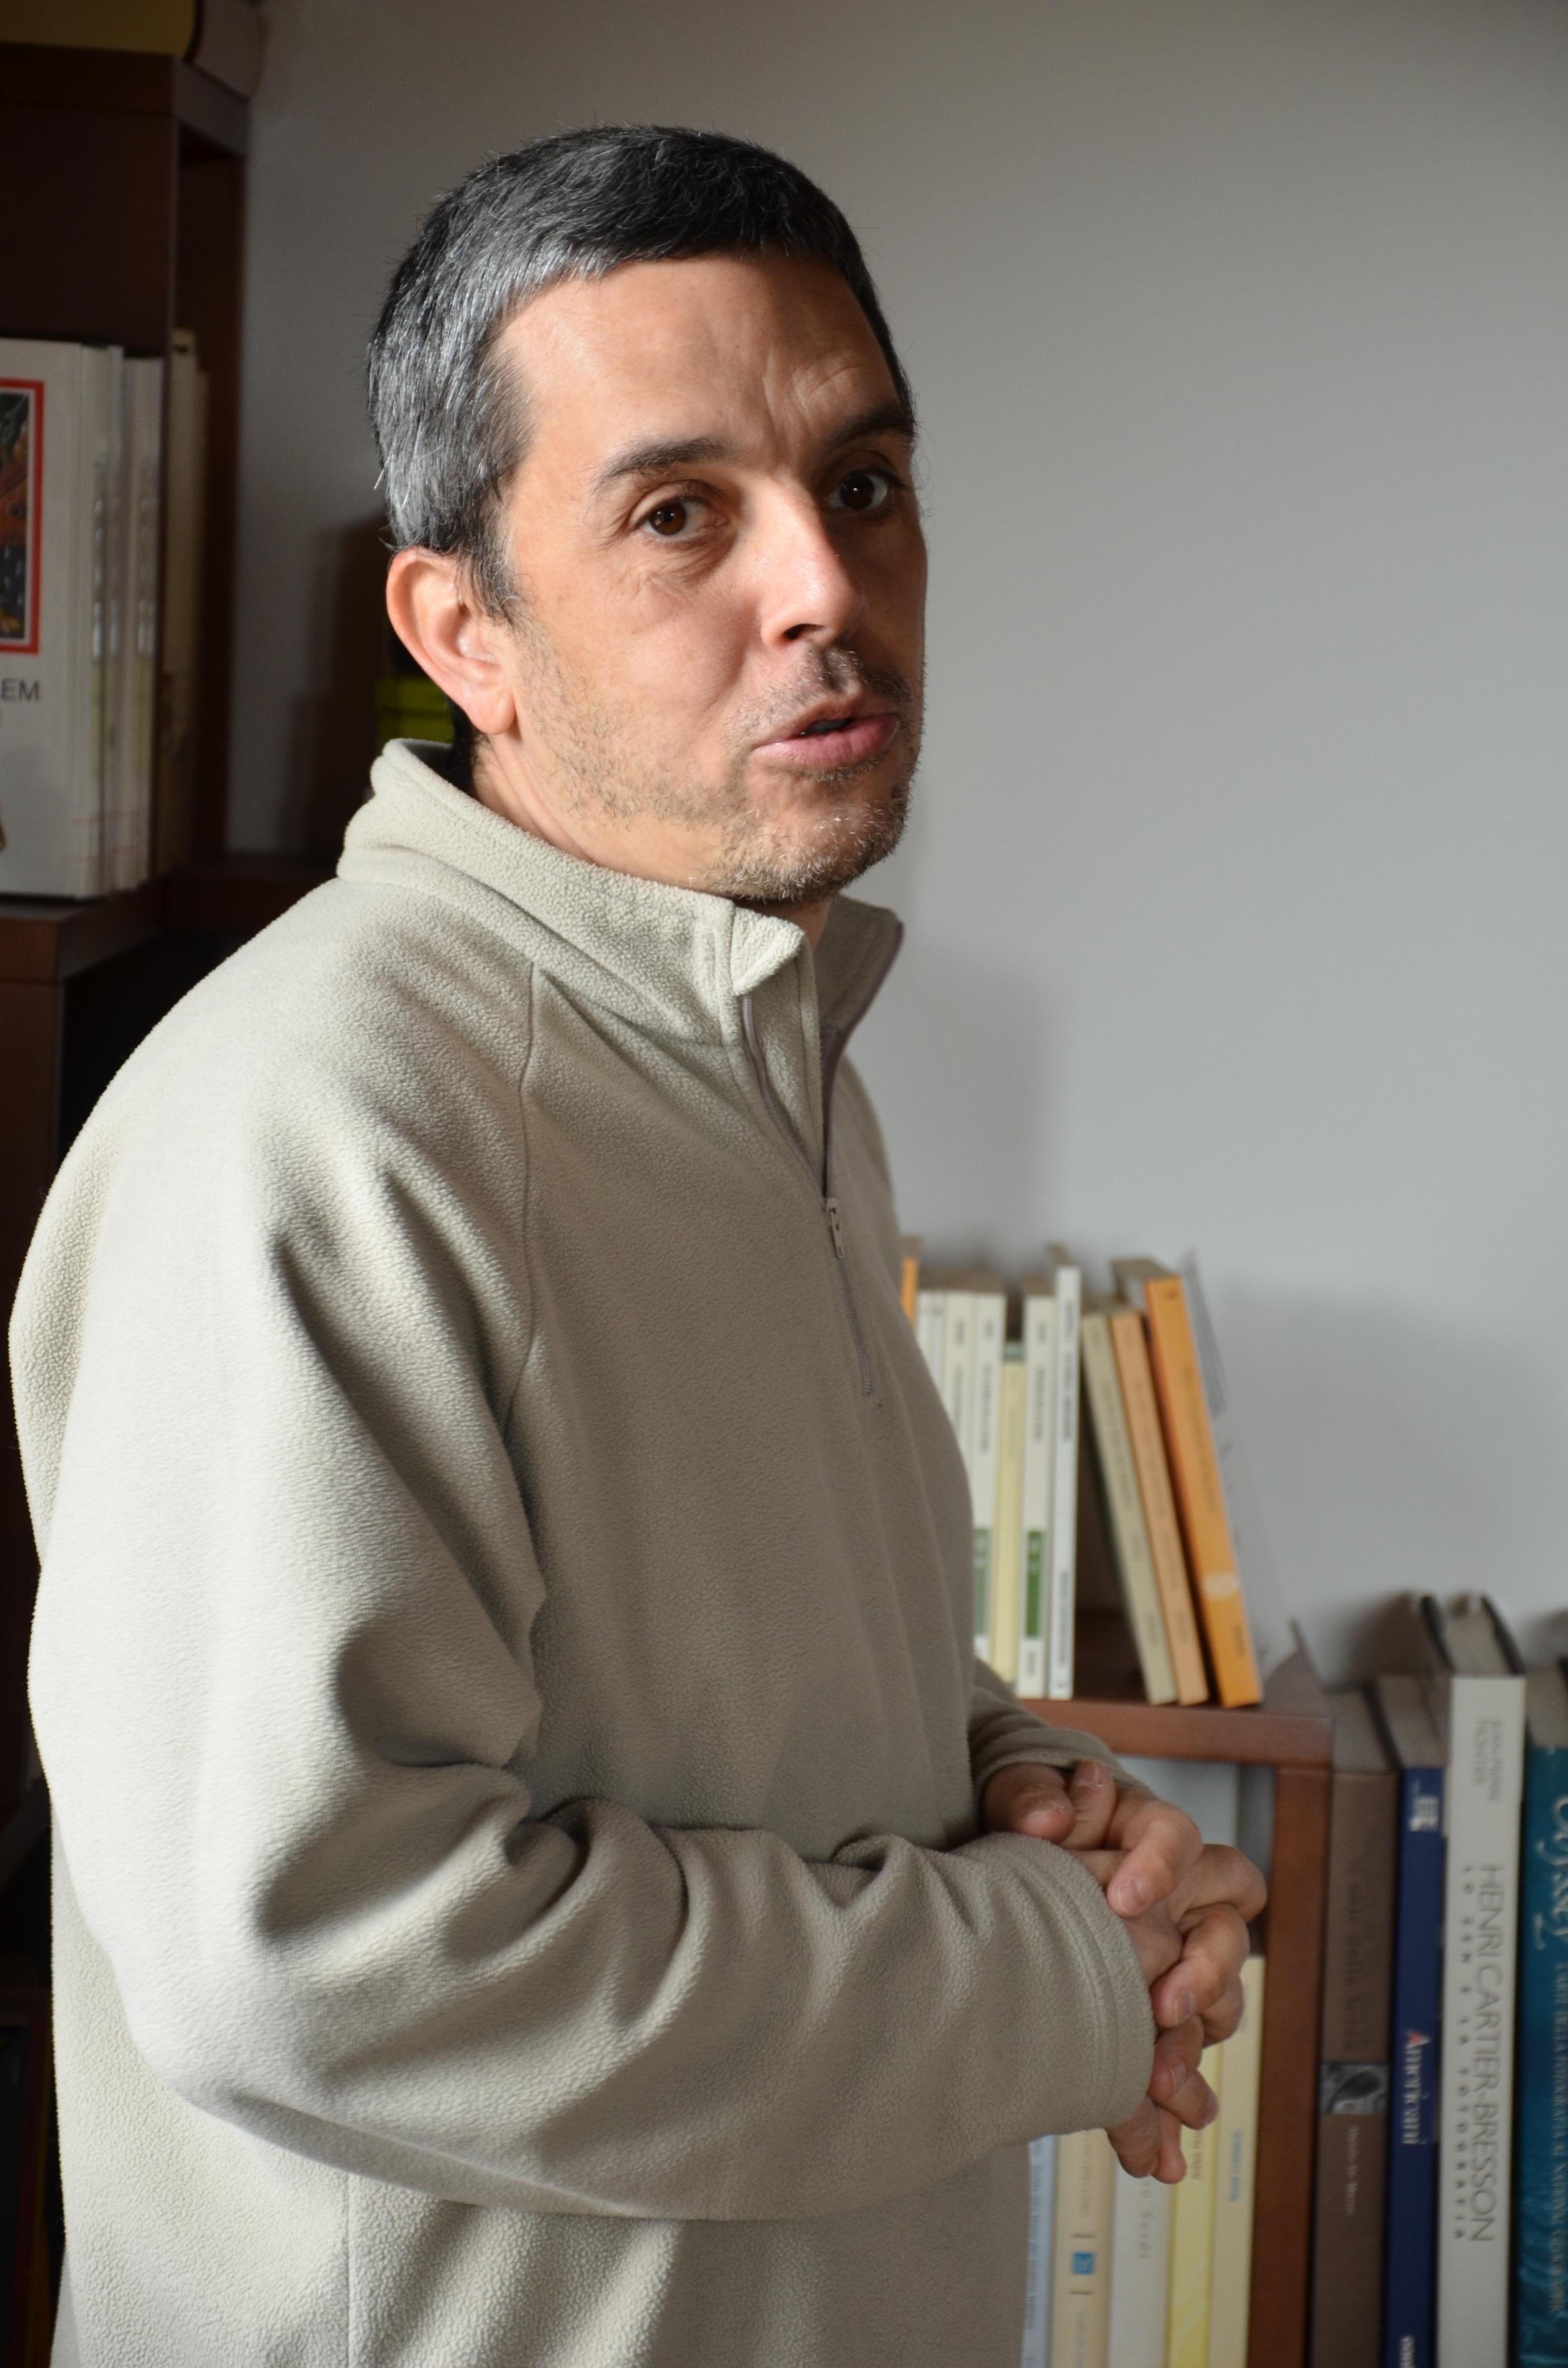 Maurizio Onnis - Penguin Books Australia